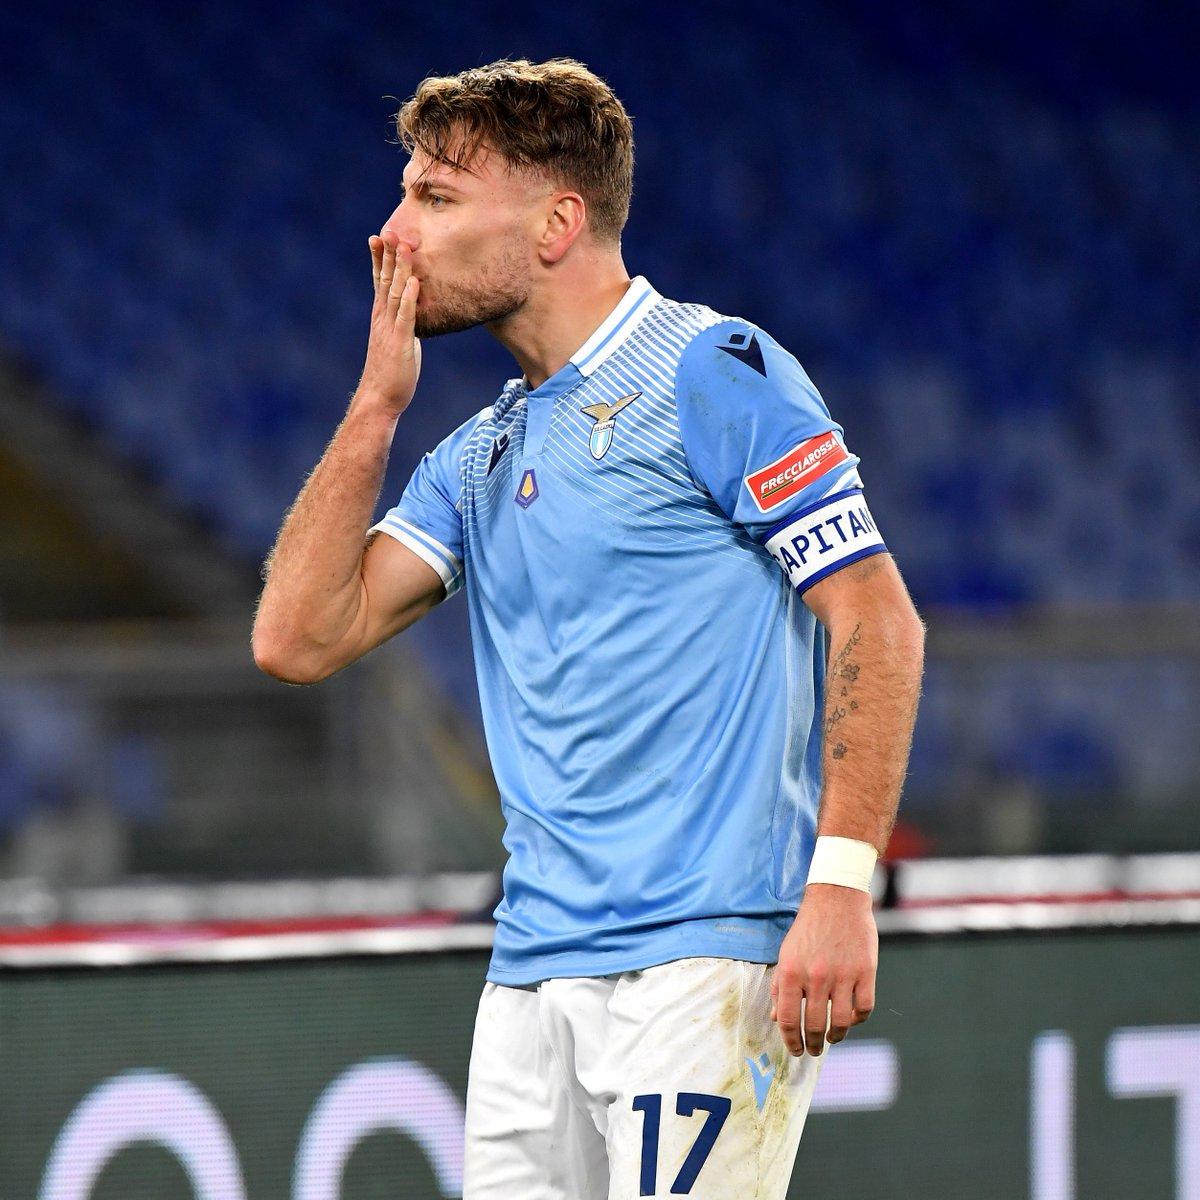 🦅 Ciro Immobile has scored 18 goals in 21 games for Lazio this season 🔥  #UCL